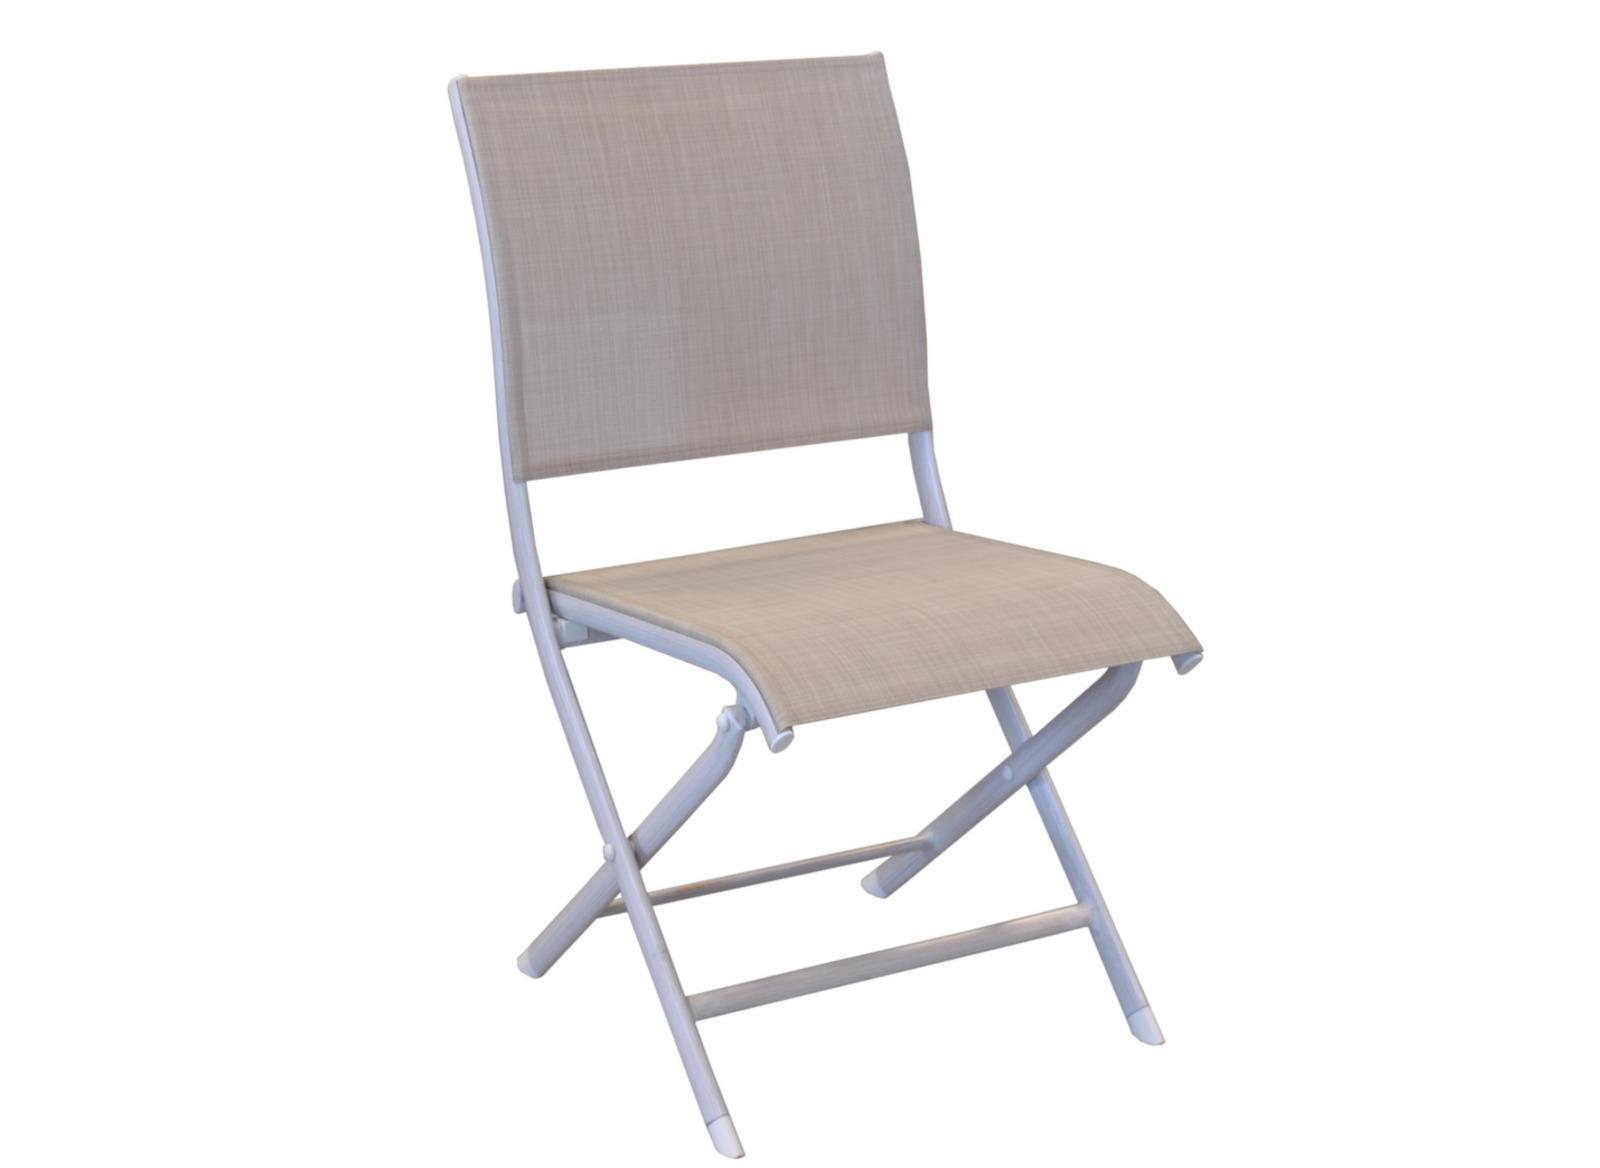 Chaise pliante Elégance (brush ou TPEP mat)